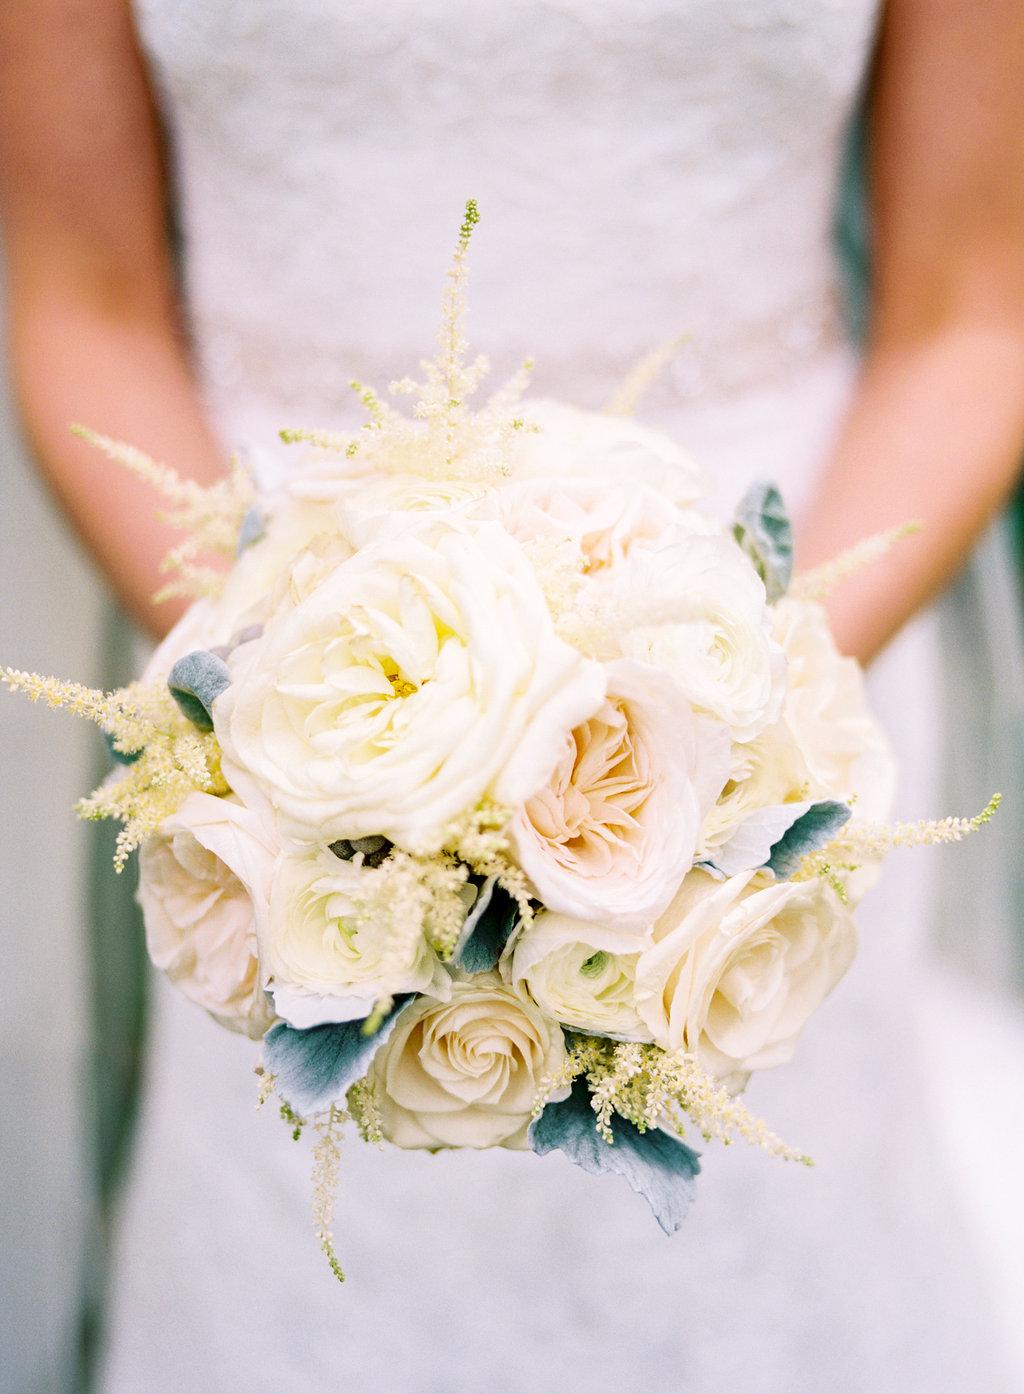 Ivory and Cream Bridal Bouquet // Nashville Wedding Flowers